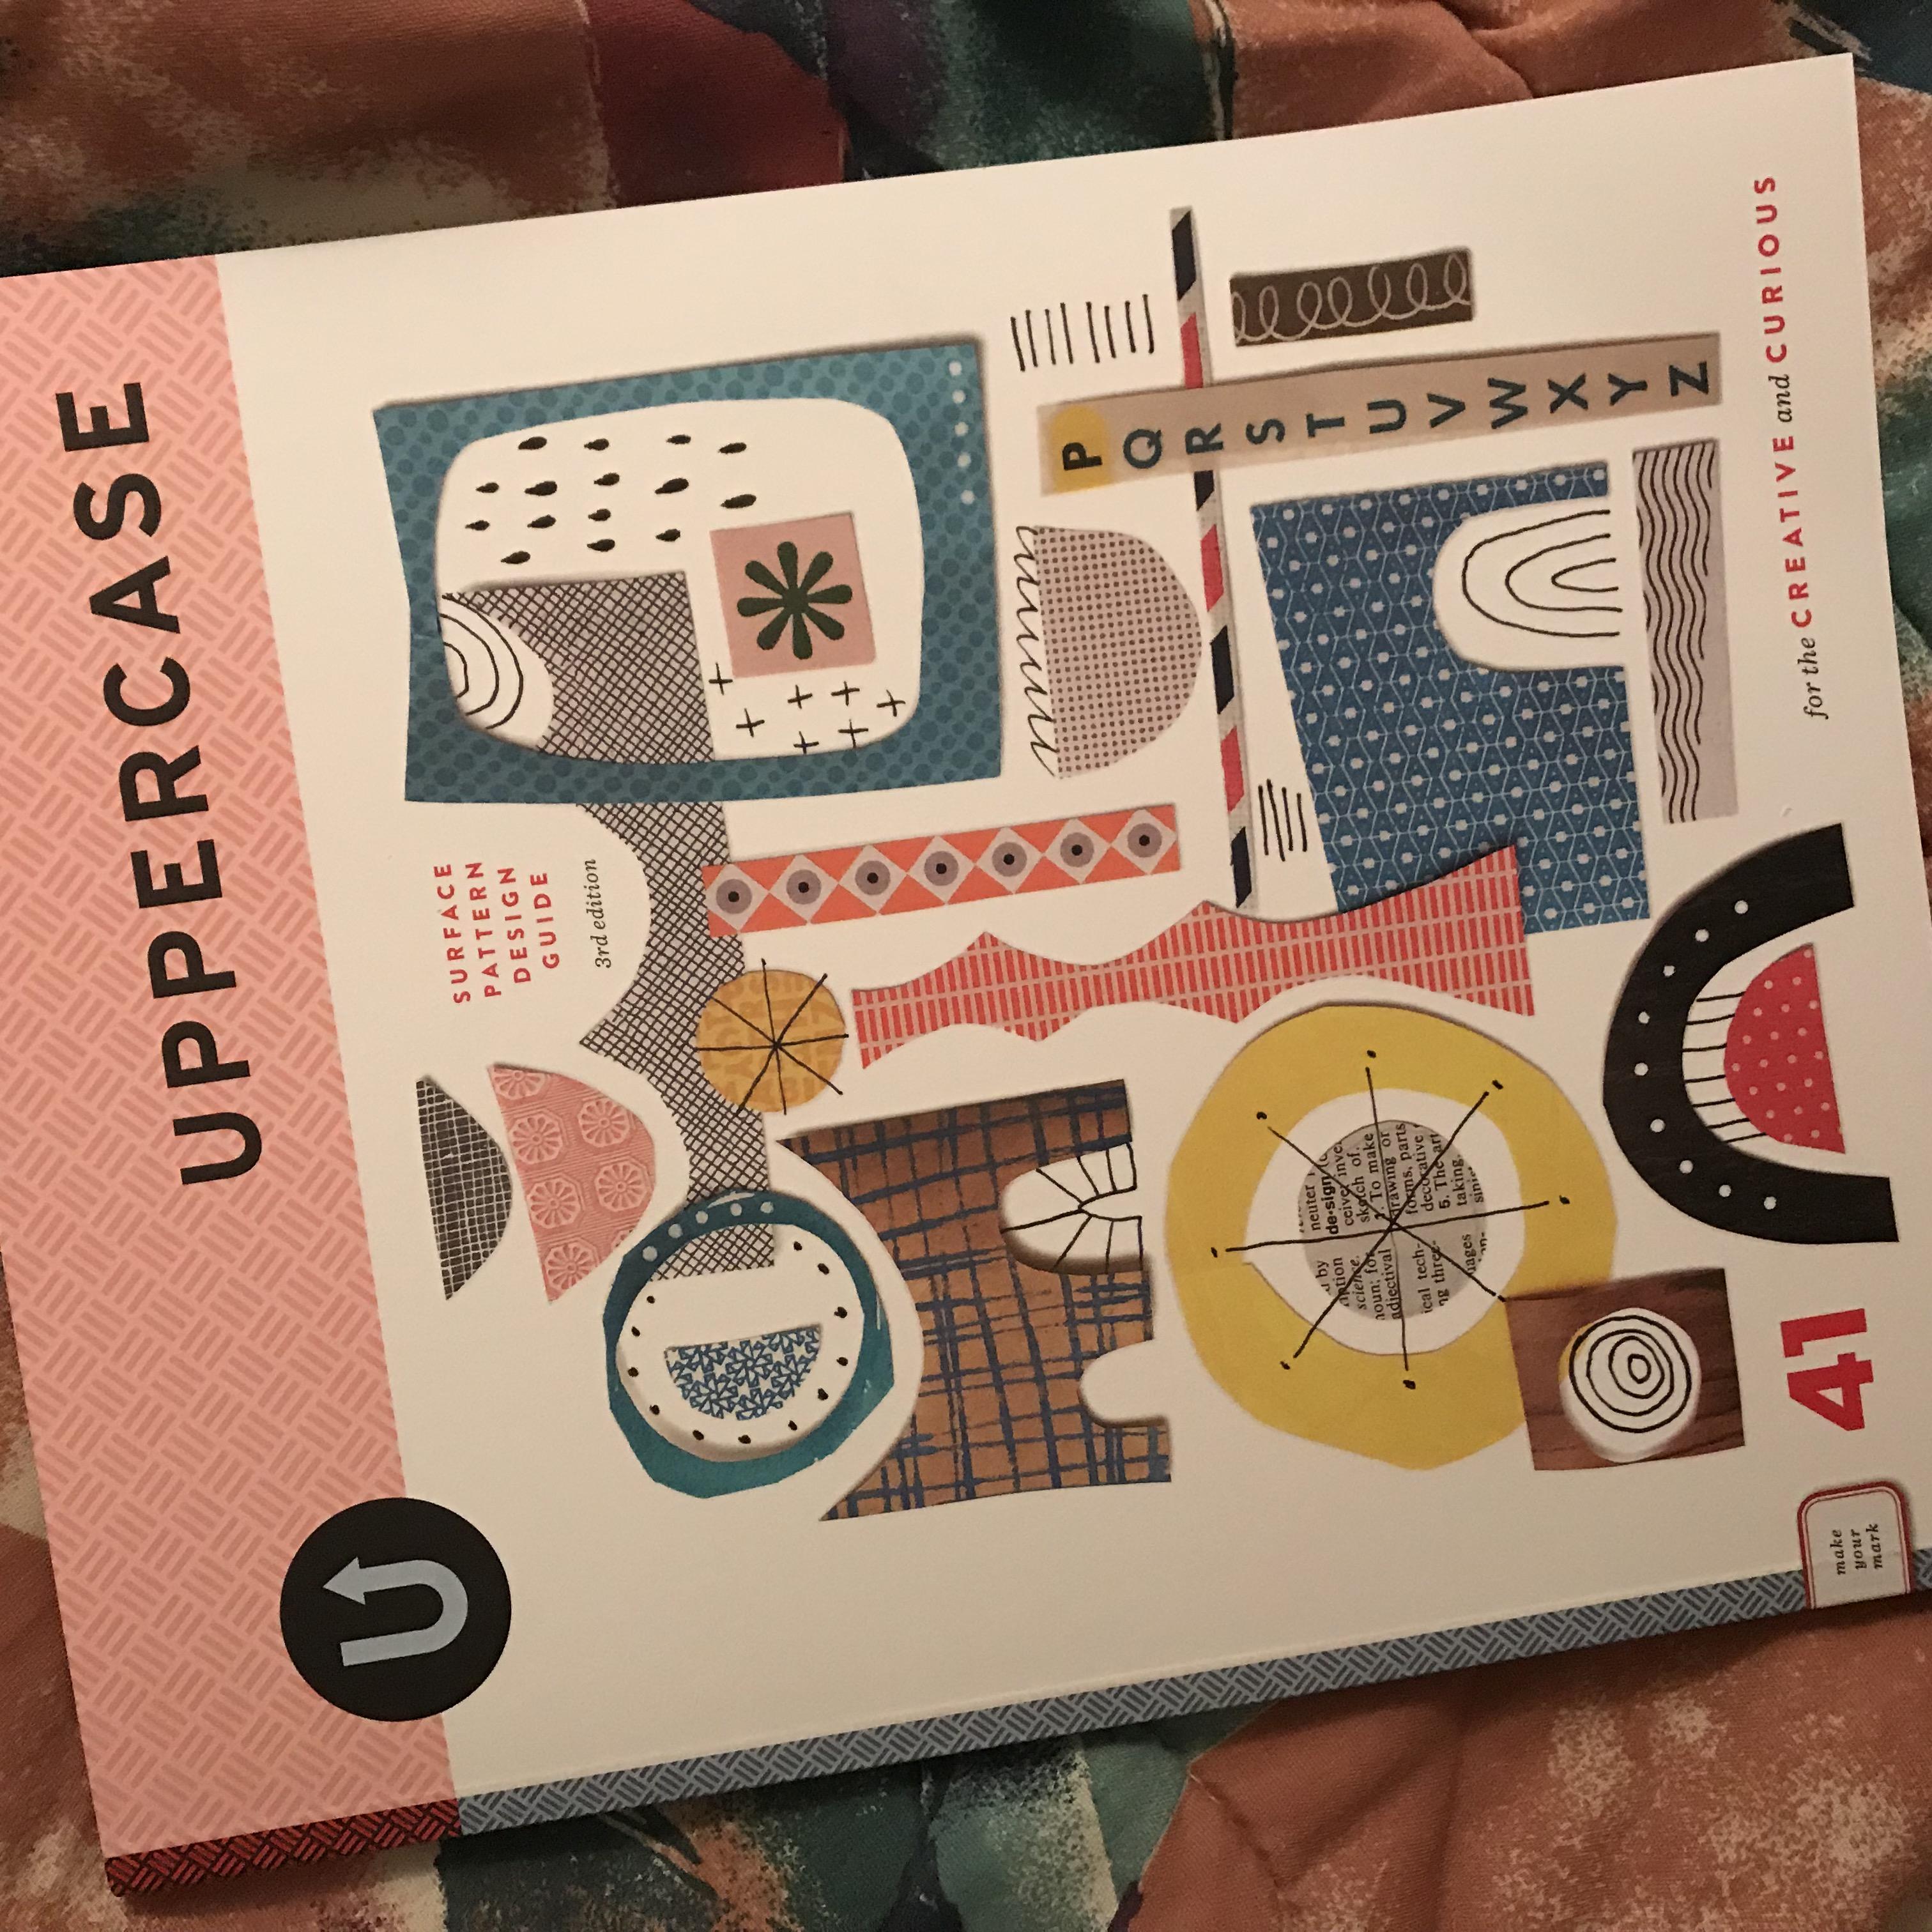 UPPERCASE Magazine Spring 2019